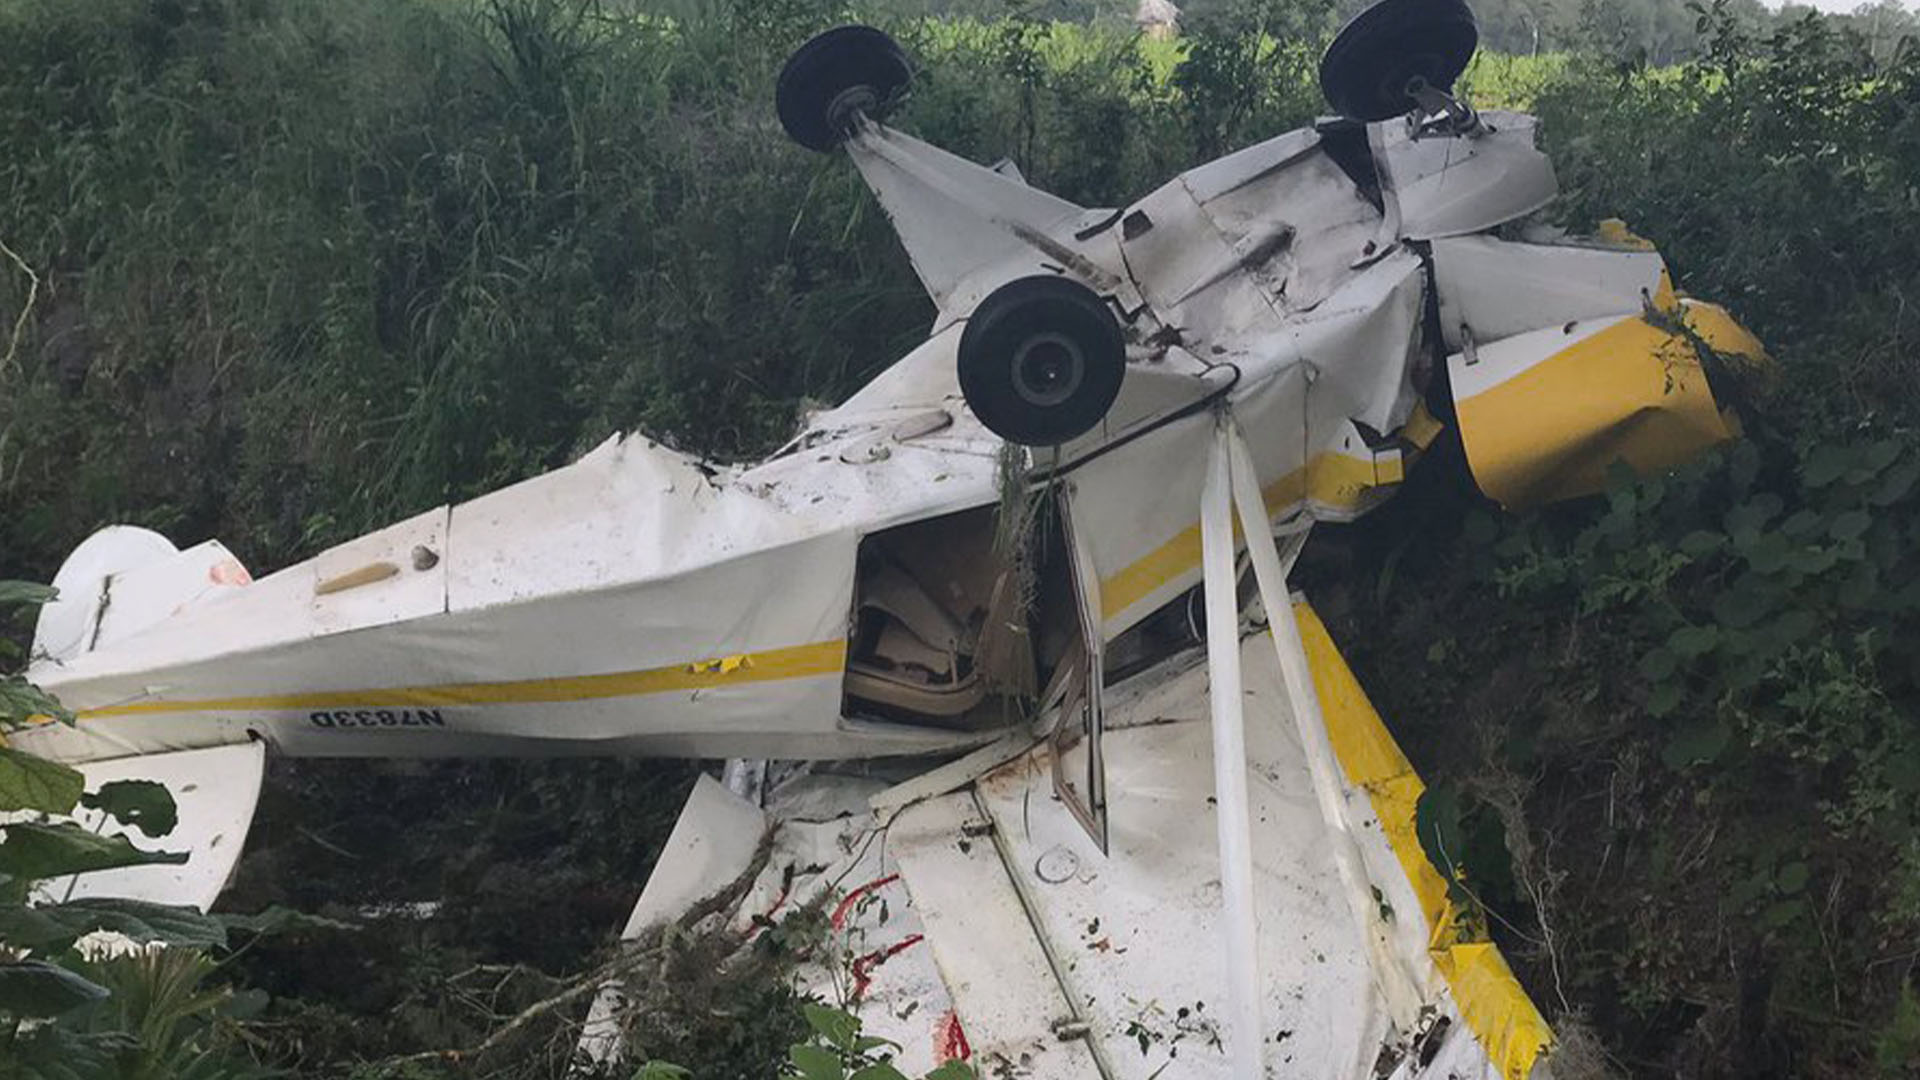 2 People Survive Small Plane Crash In Florida Wfla